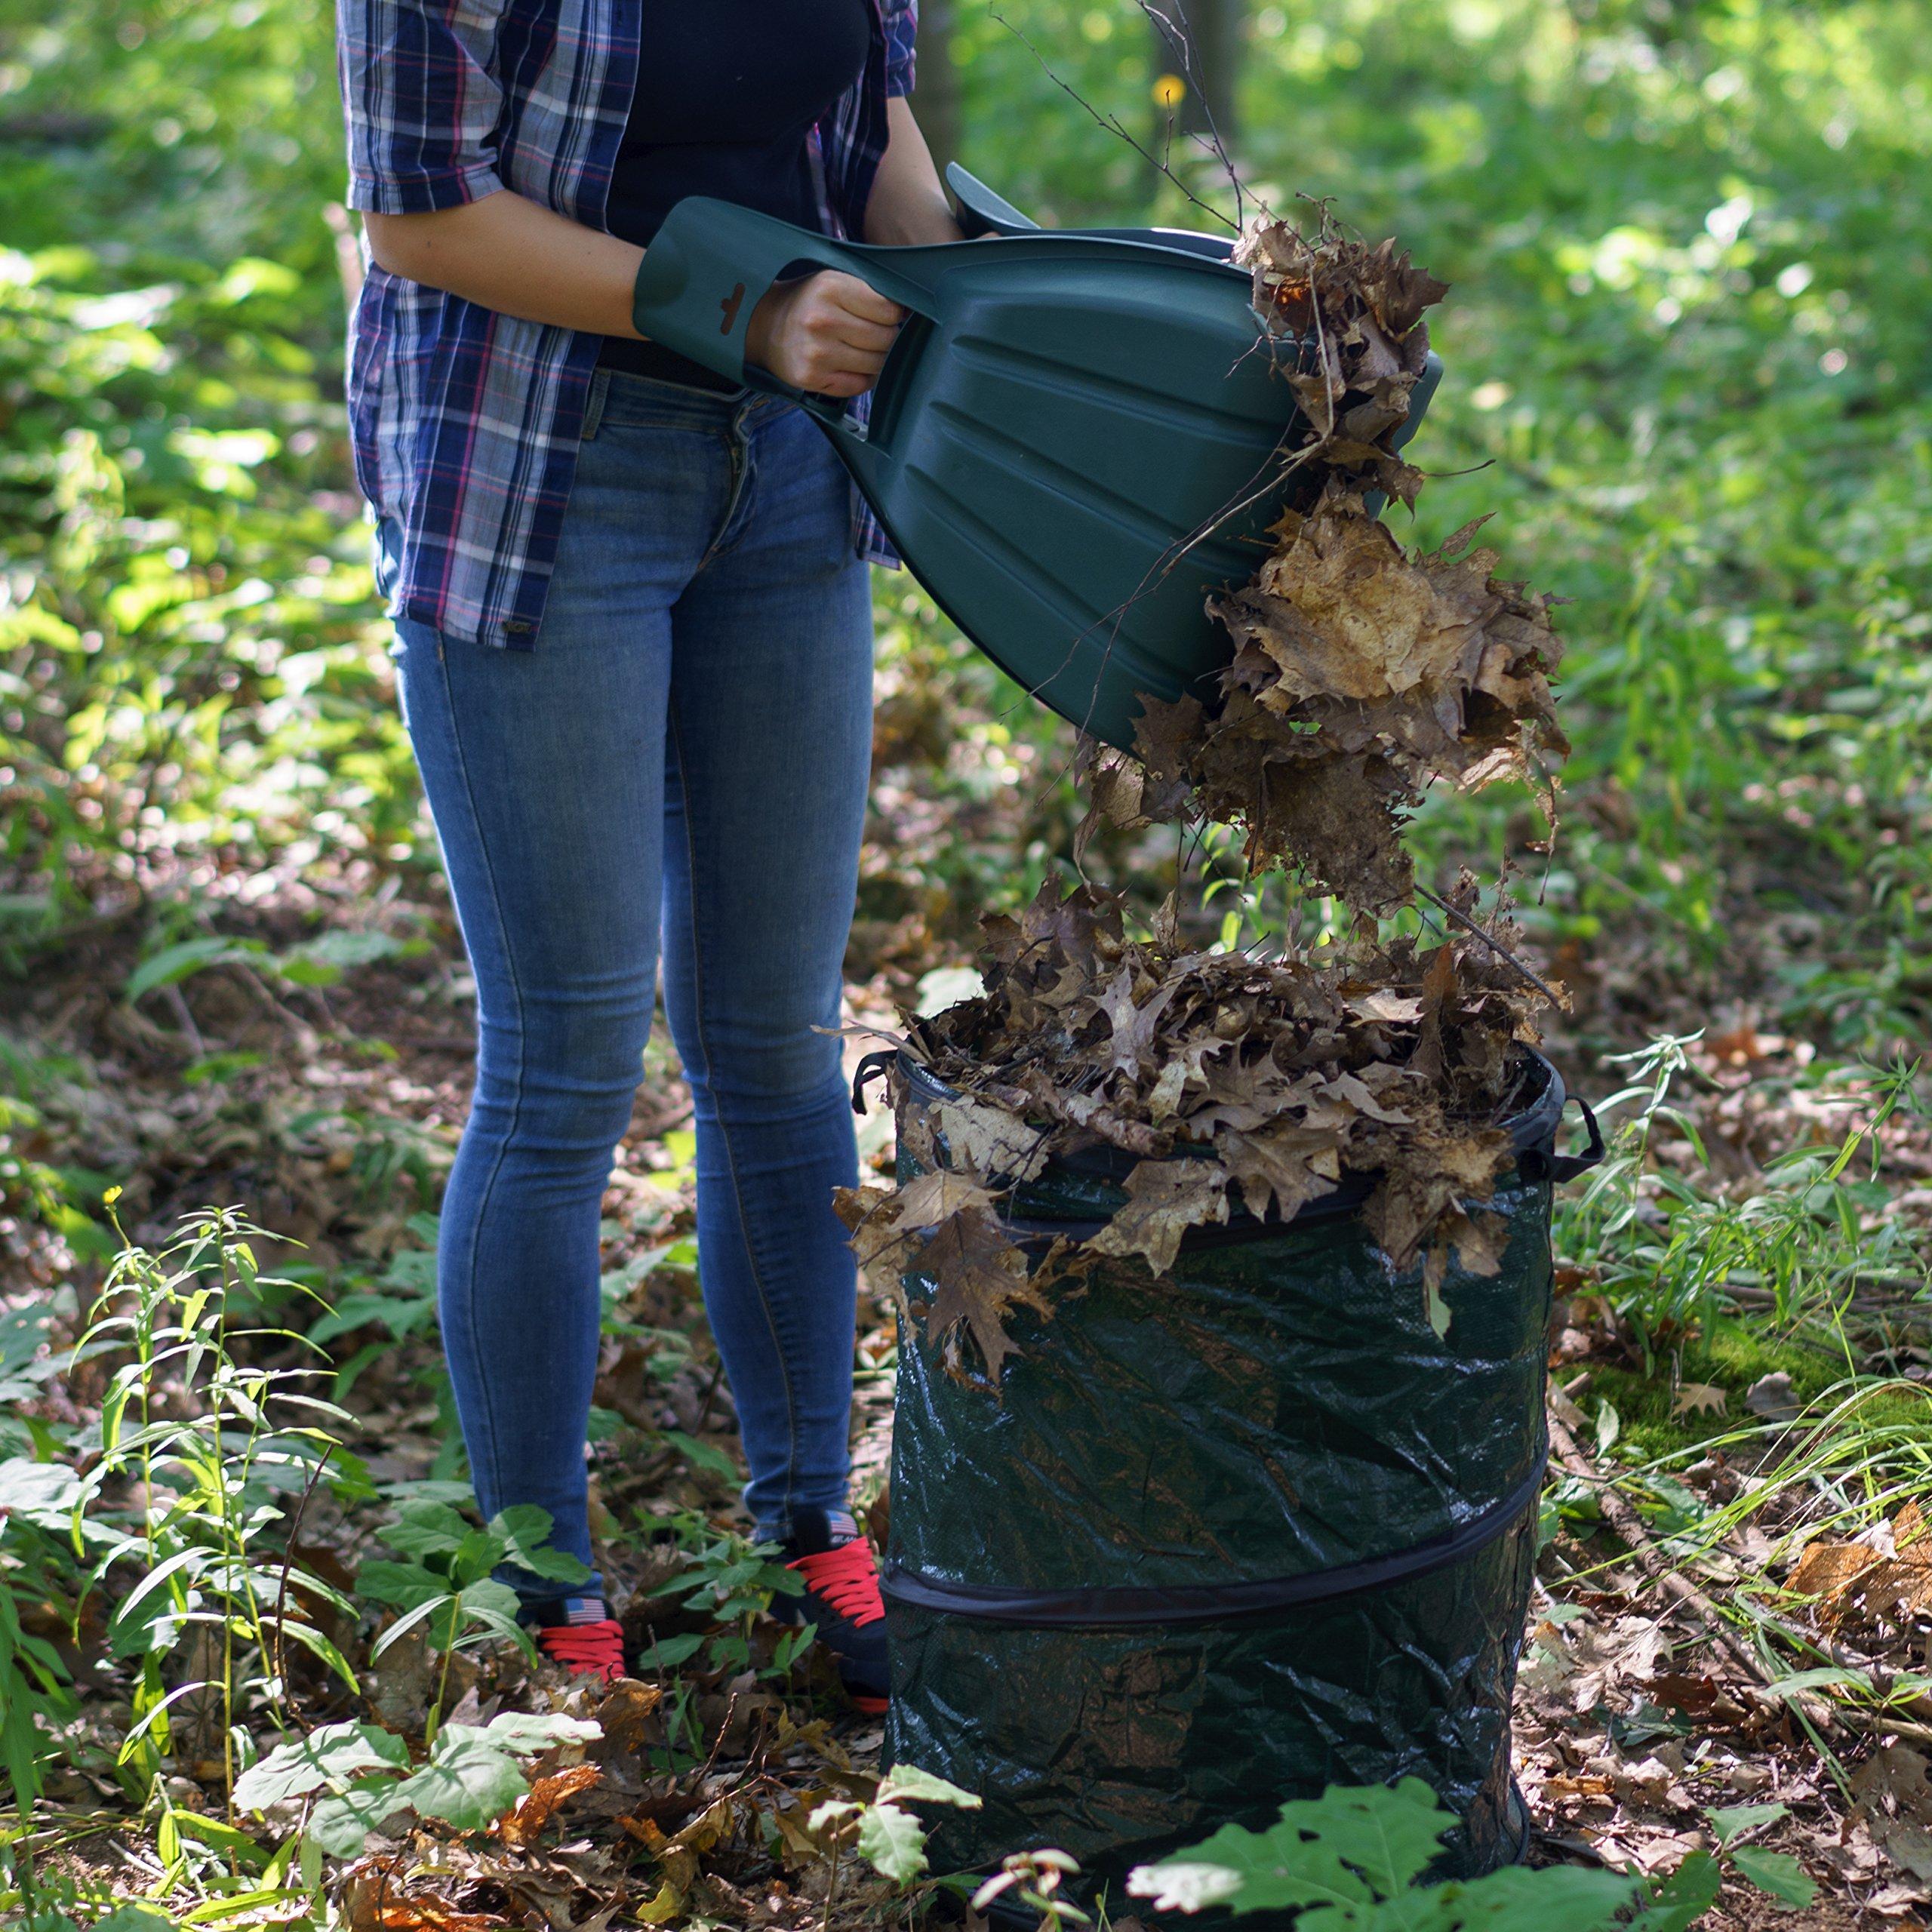 Kenley Leaf Scoops with Collapsible Yard Waste Garbage Bag Composting Bin – Leaf Hand Rakes for Leaves Grass Debris - Grabber Picker Tool for Garden or Lawn with Pop Up Composting Garbage Bag by Kenley (Image #3)